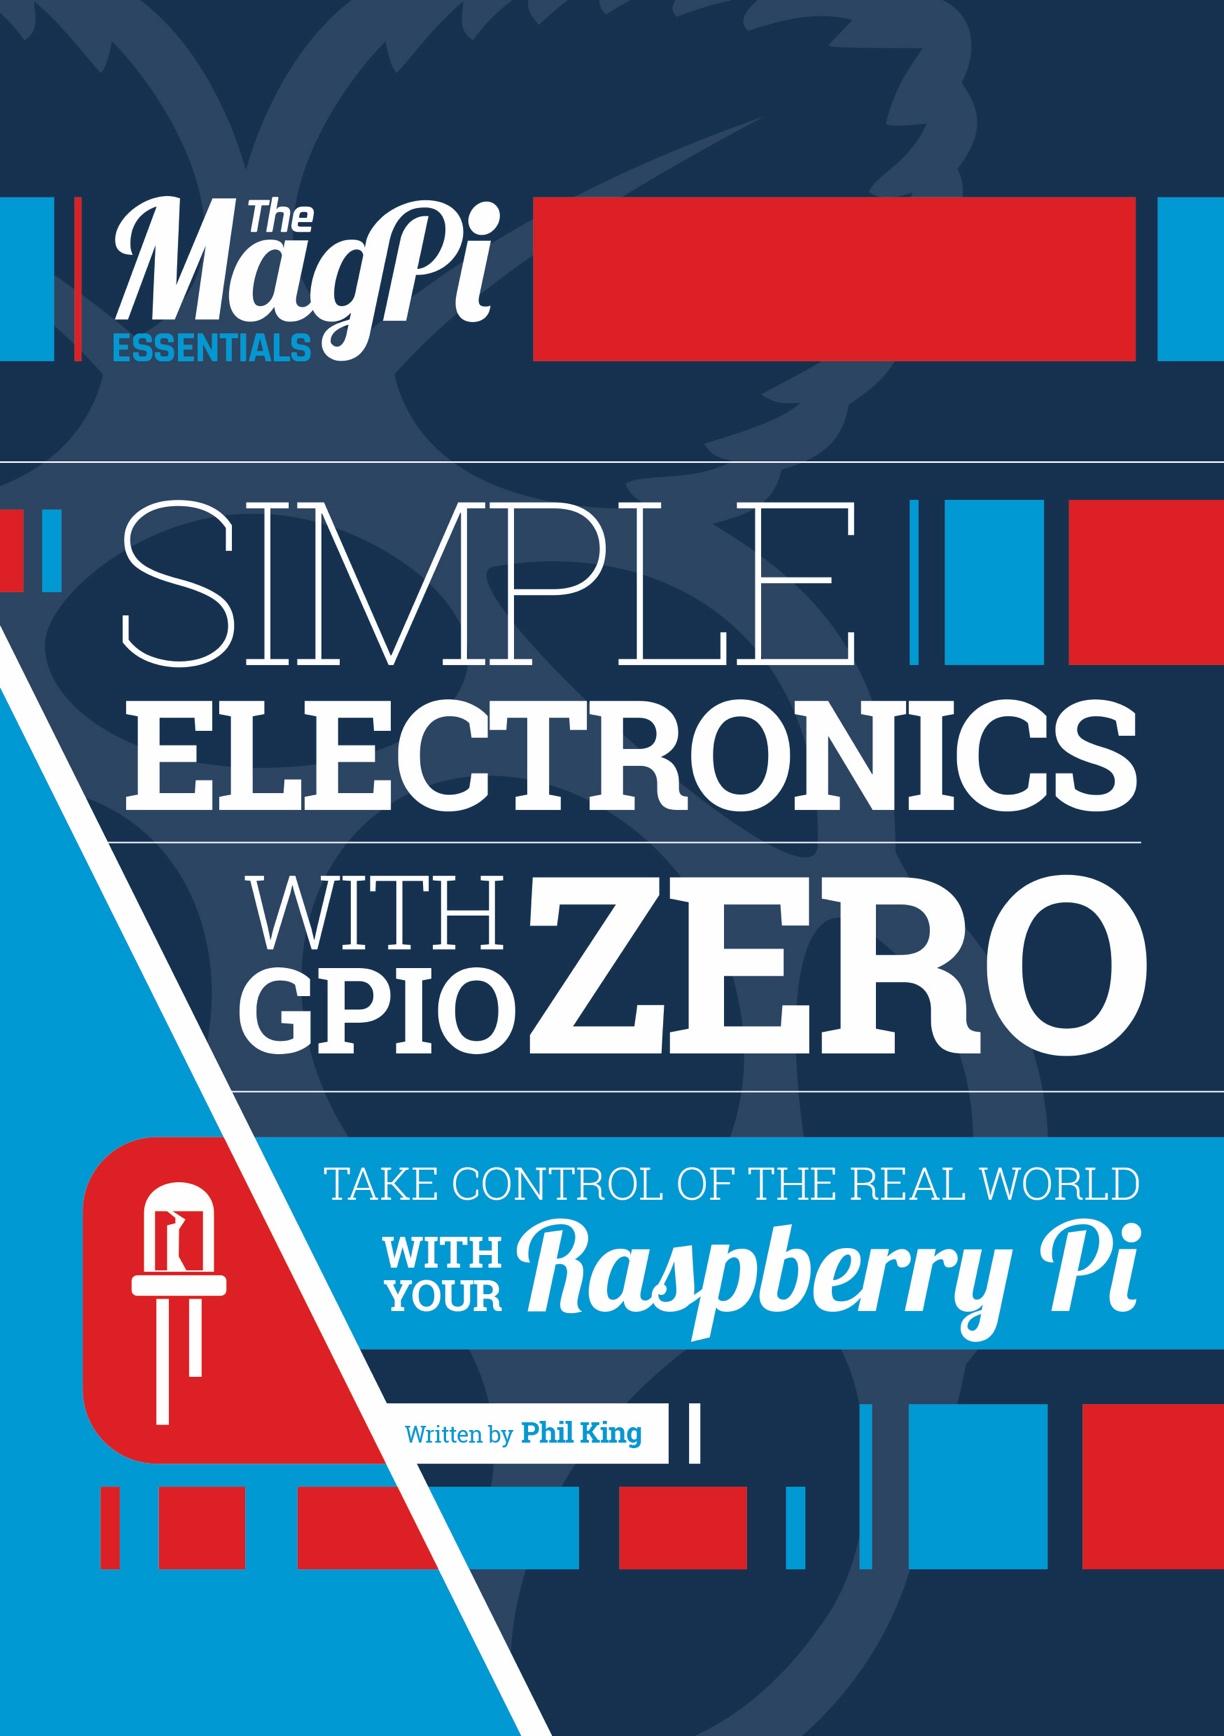 New MagPi Essentials book: simple electronics